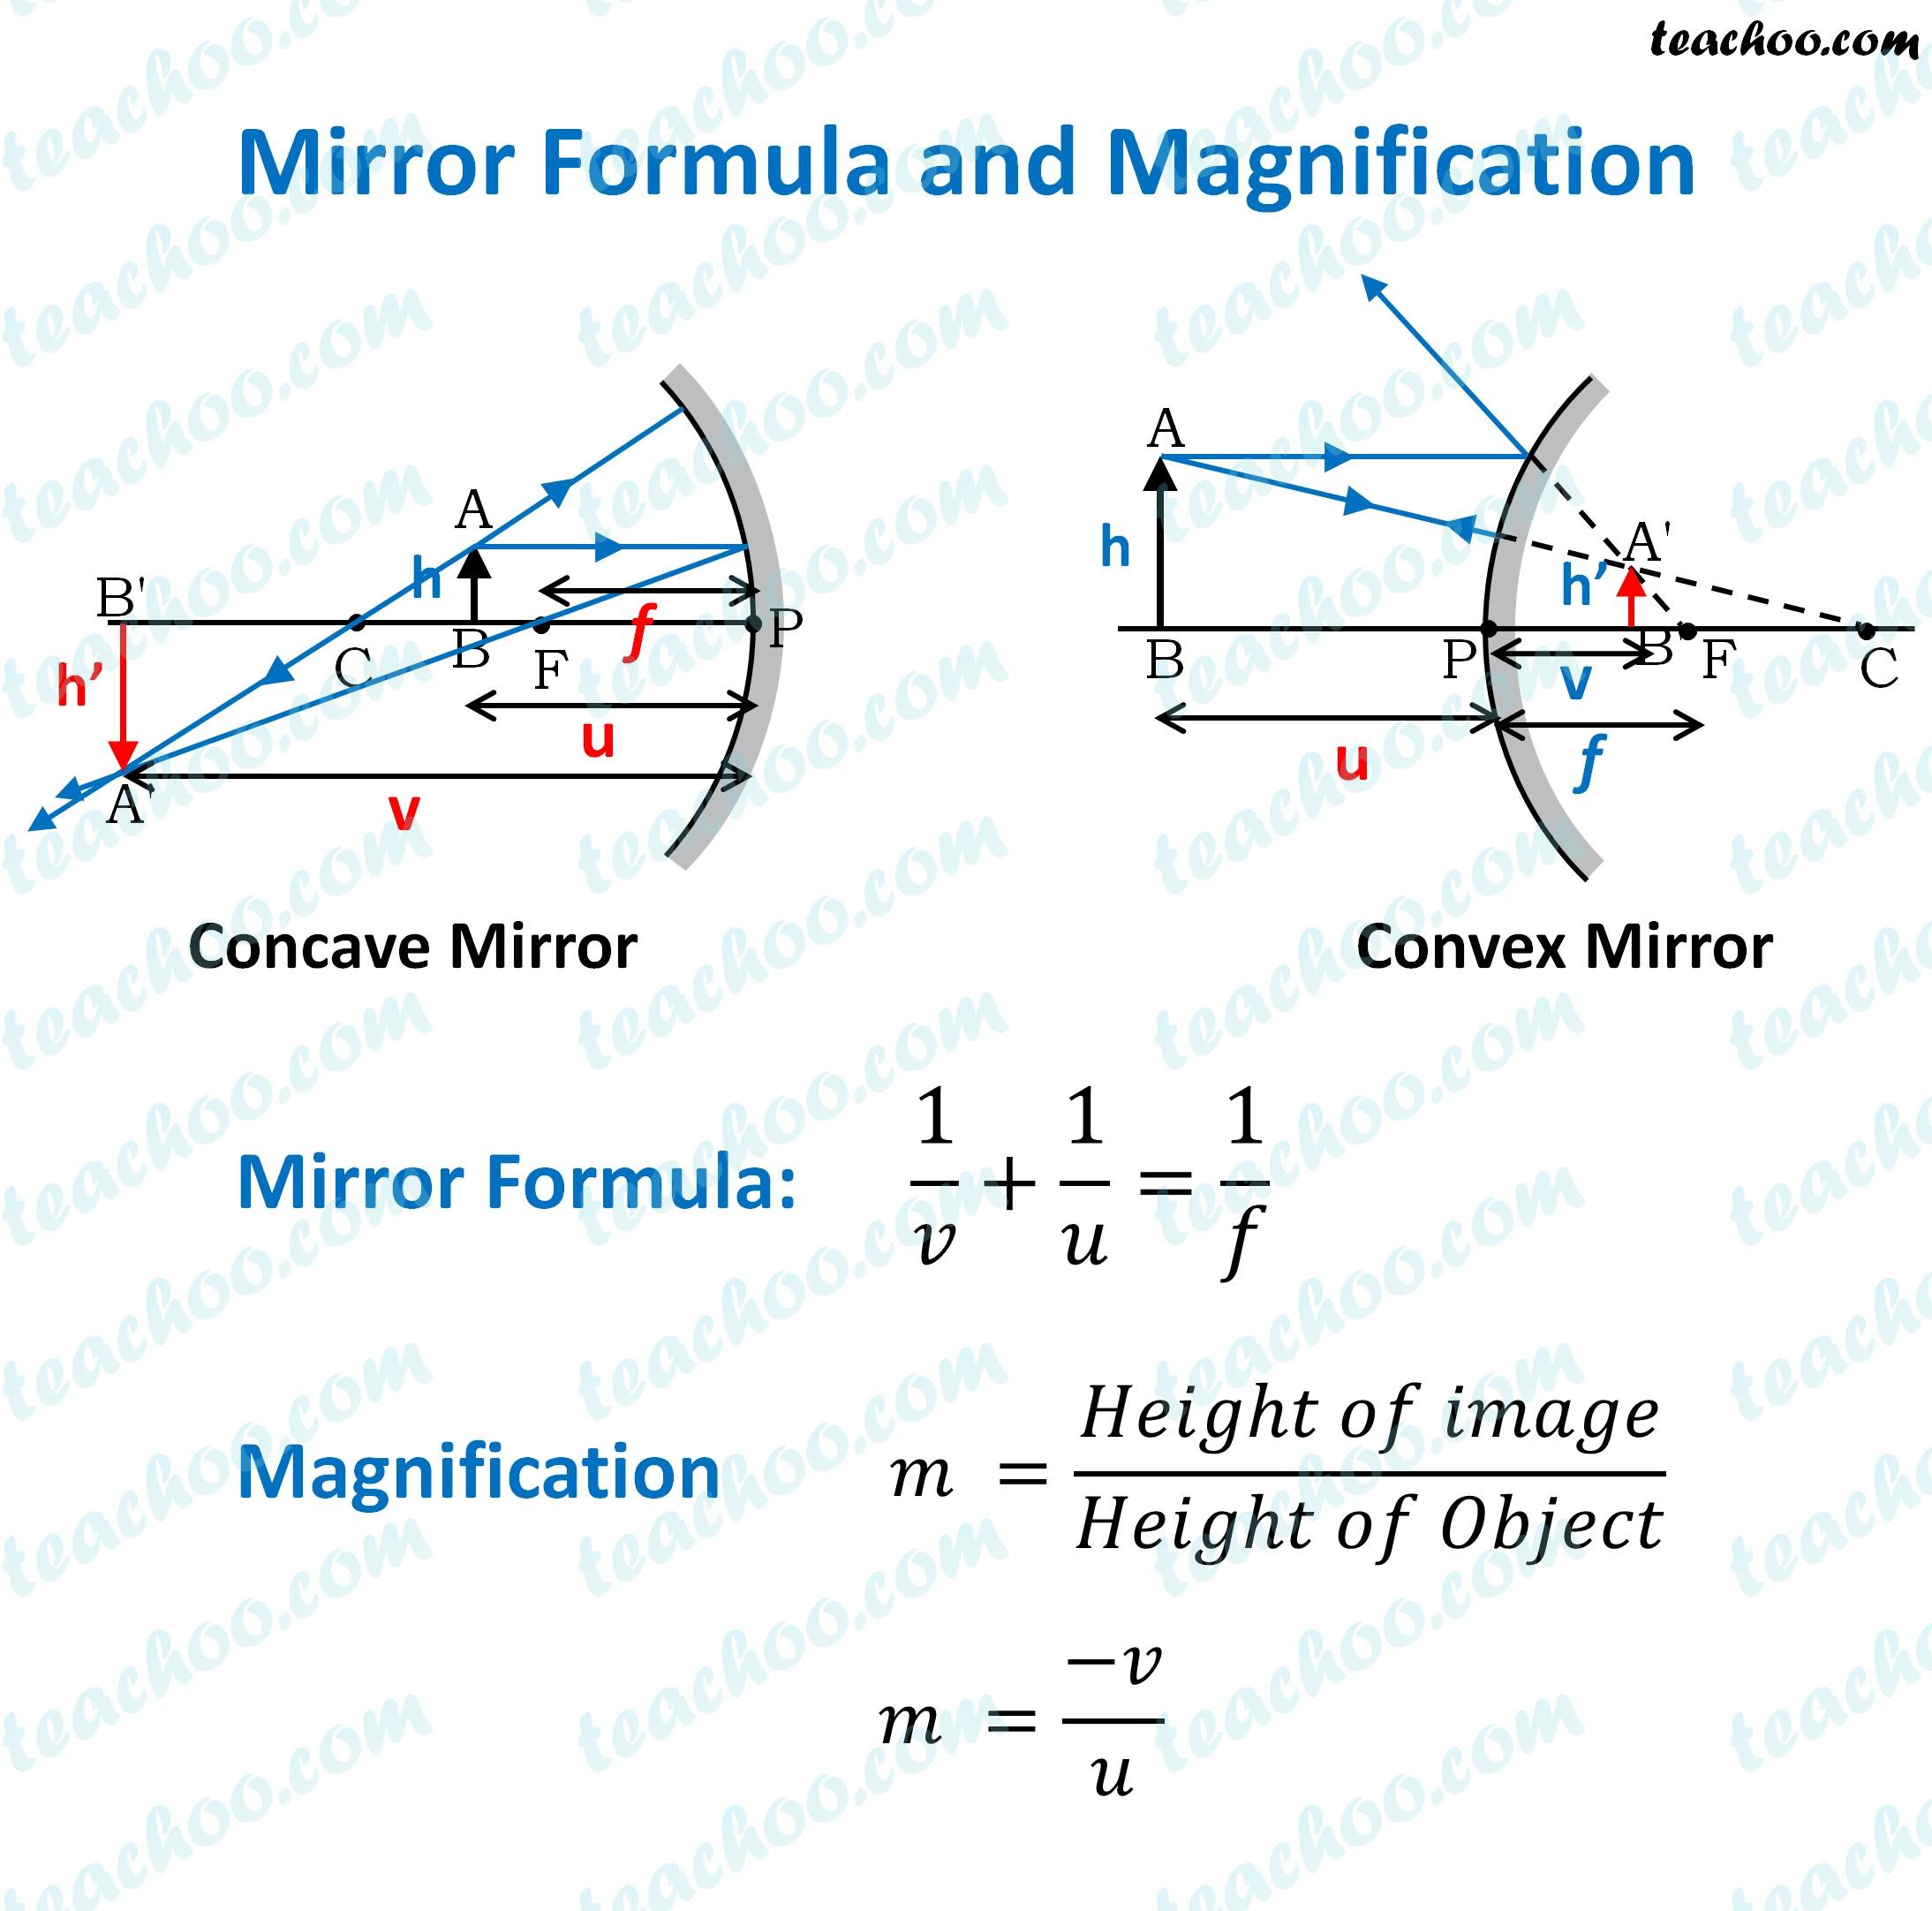 mirror-formula-and-magnification---teachoo.jpg